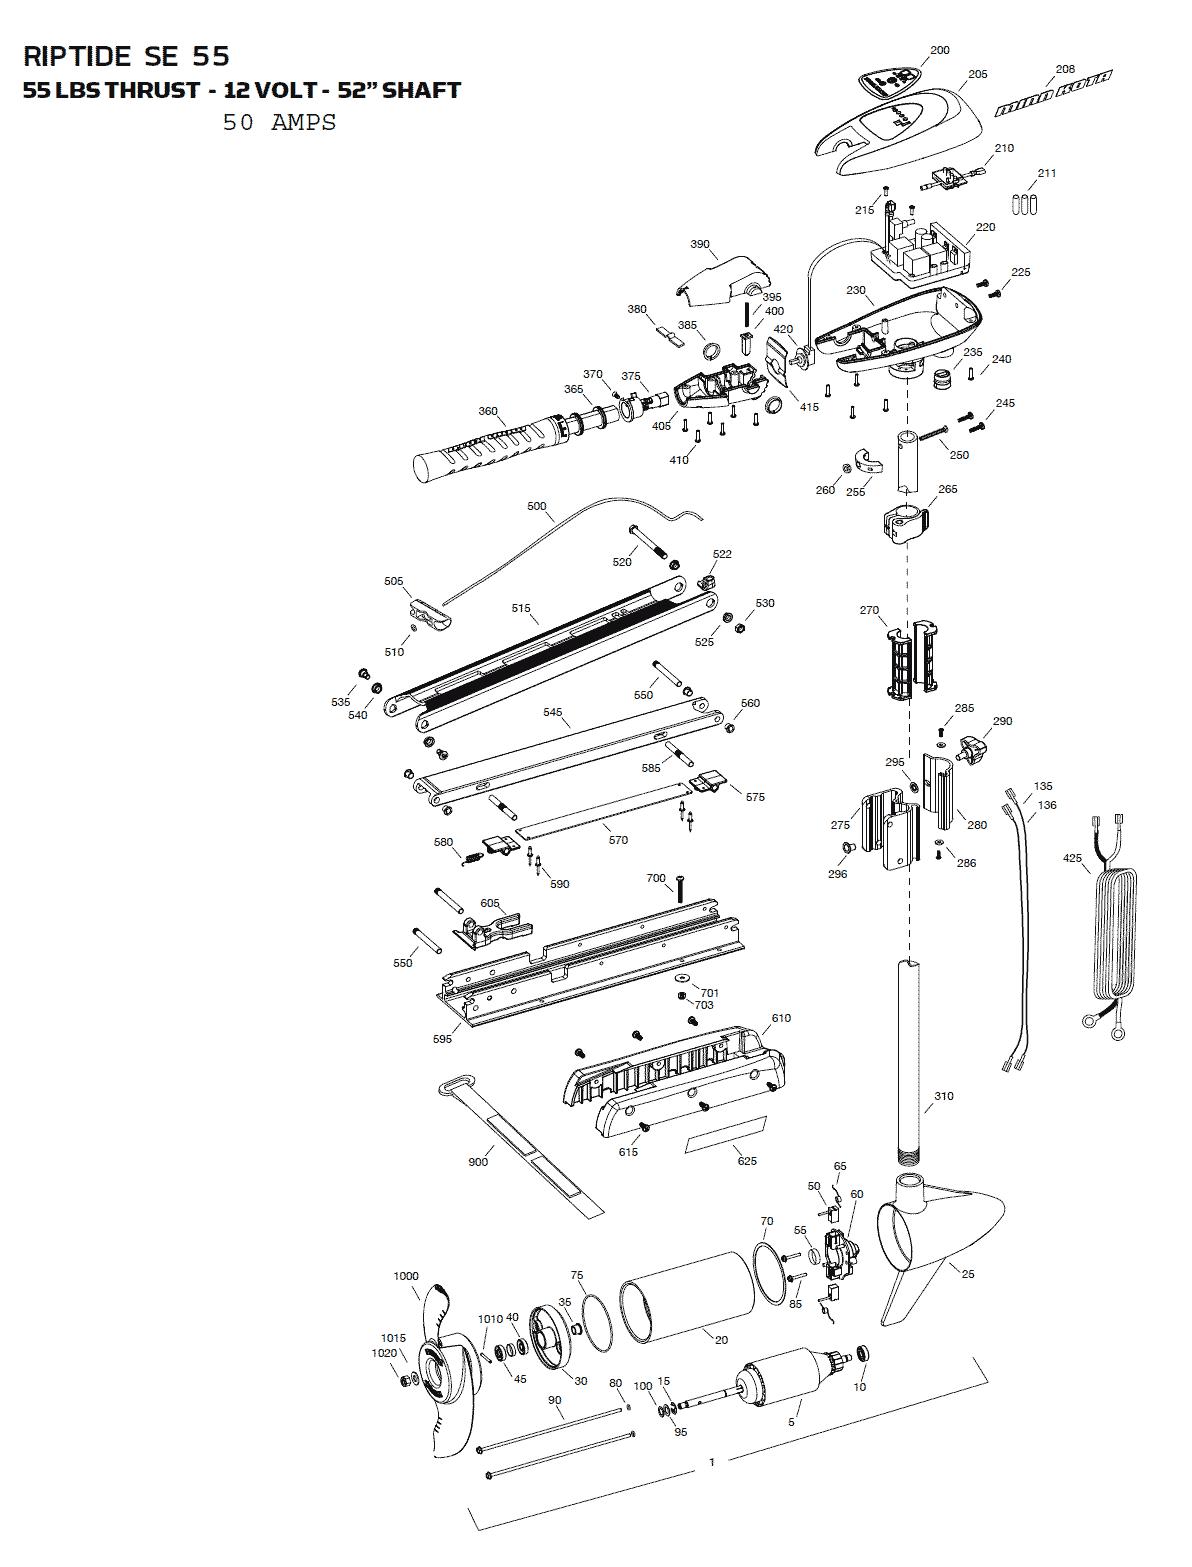 minn kota 24v wiring diagram plug minn kota riptide 55 se parts - 2015 from fish307.com minn kota 55 wiring diagram